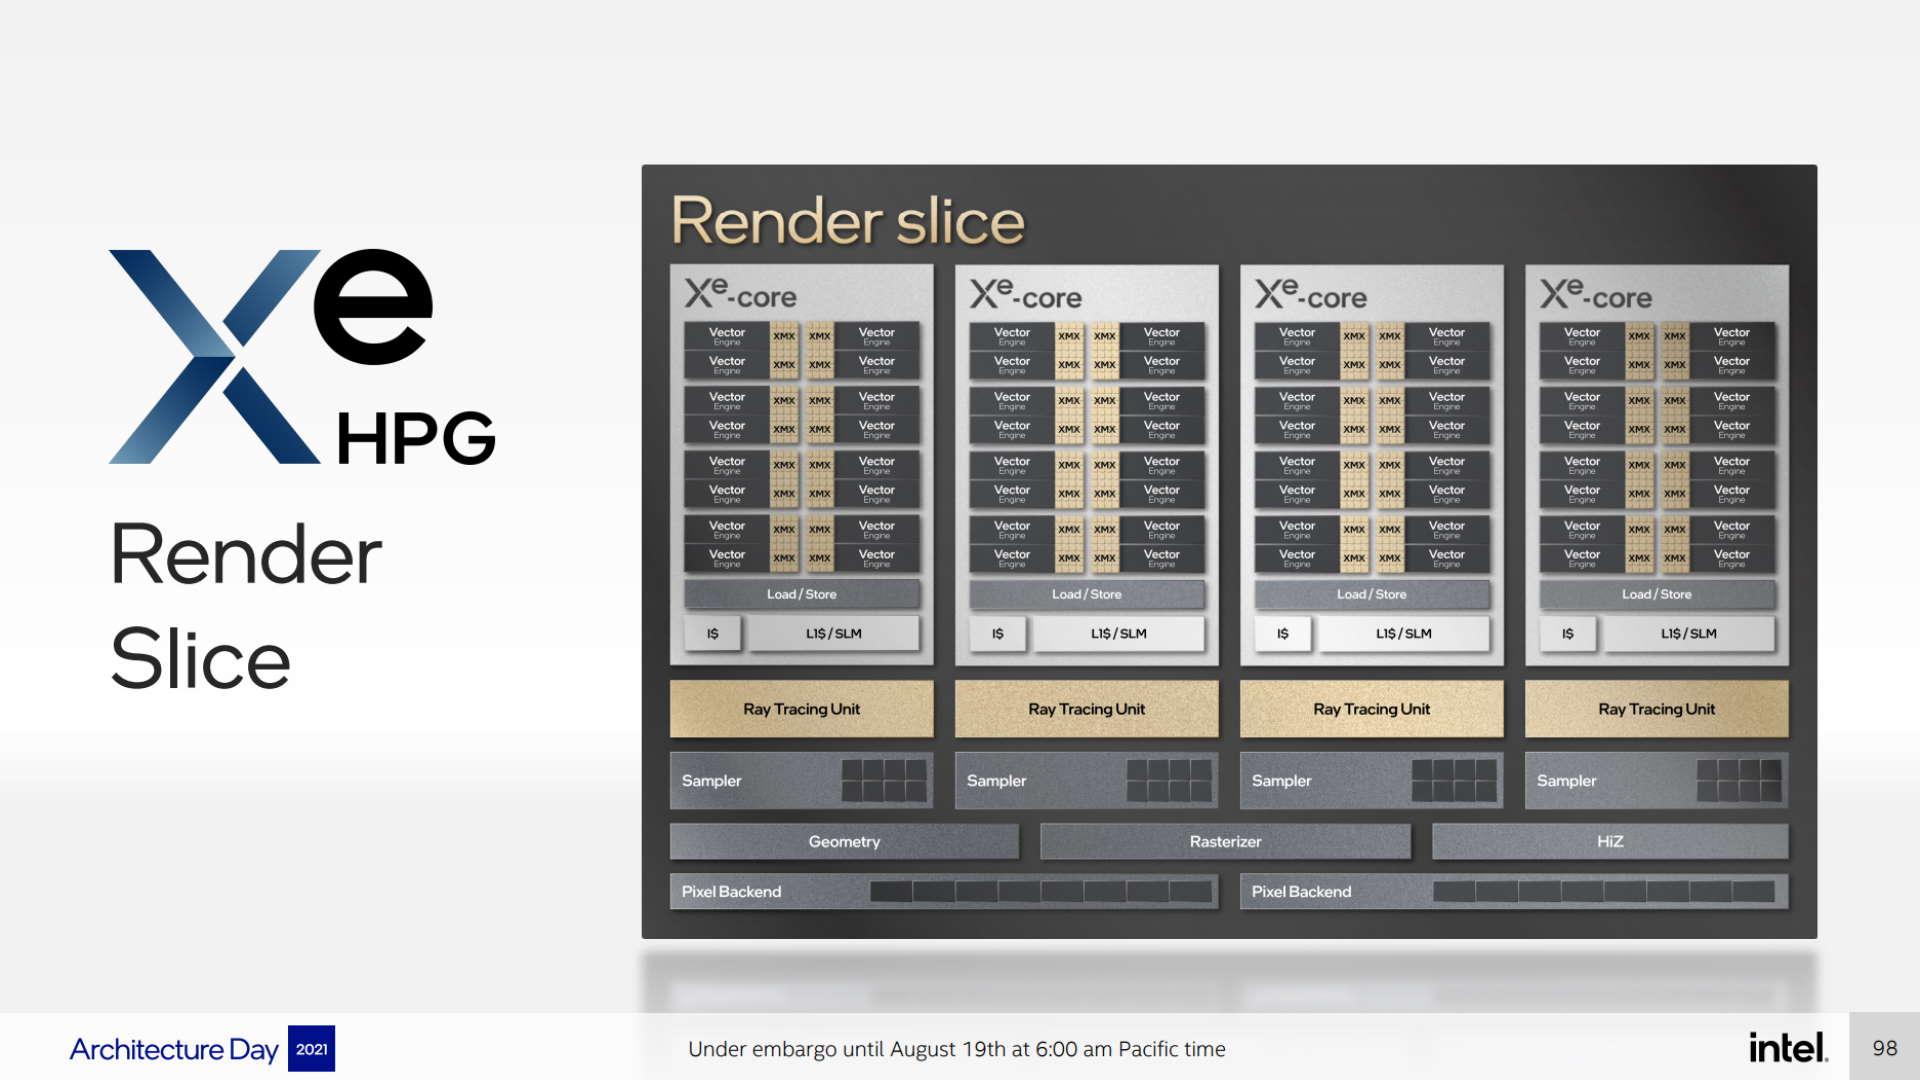 Intel Xe-HPG GPU details